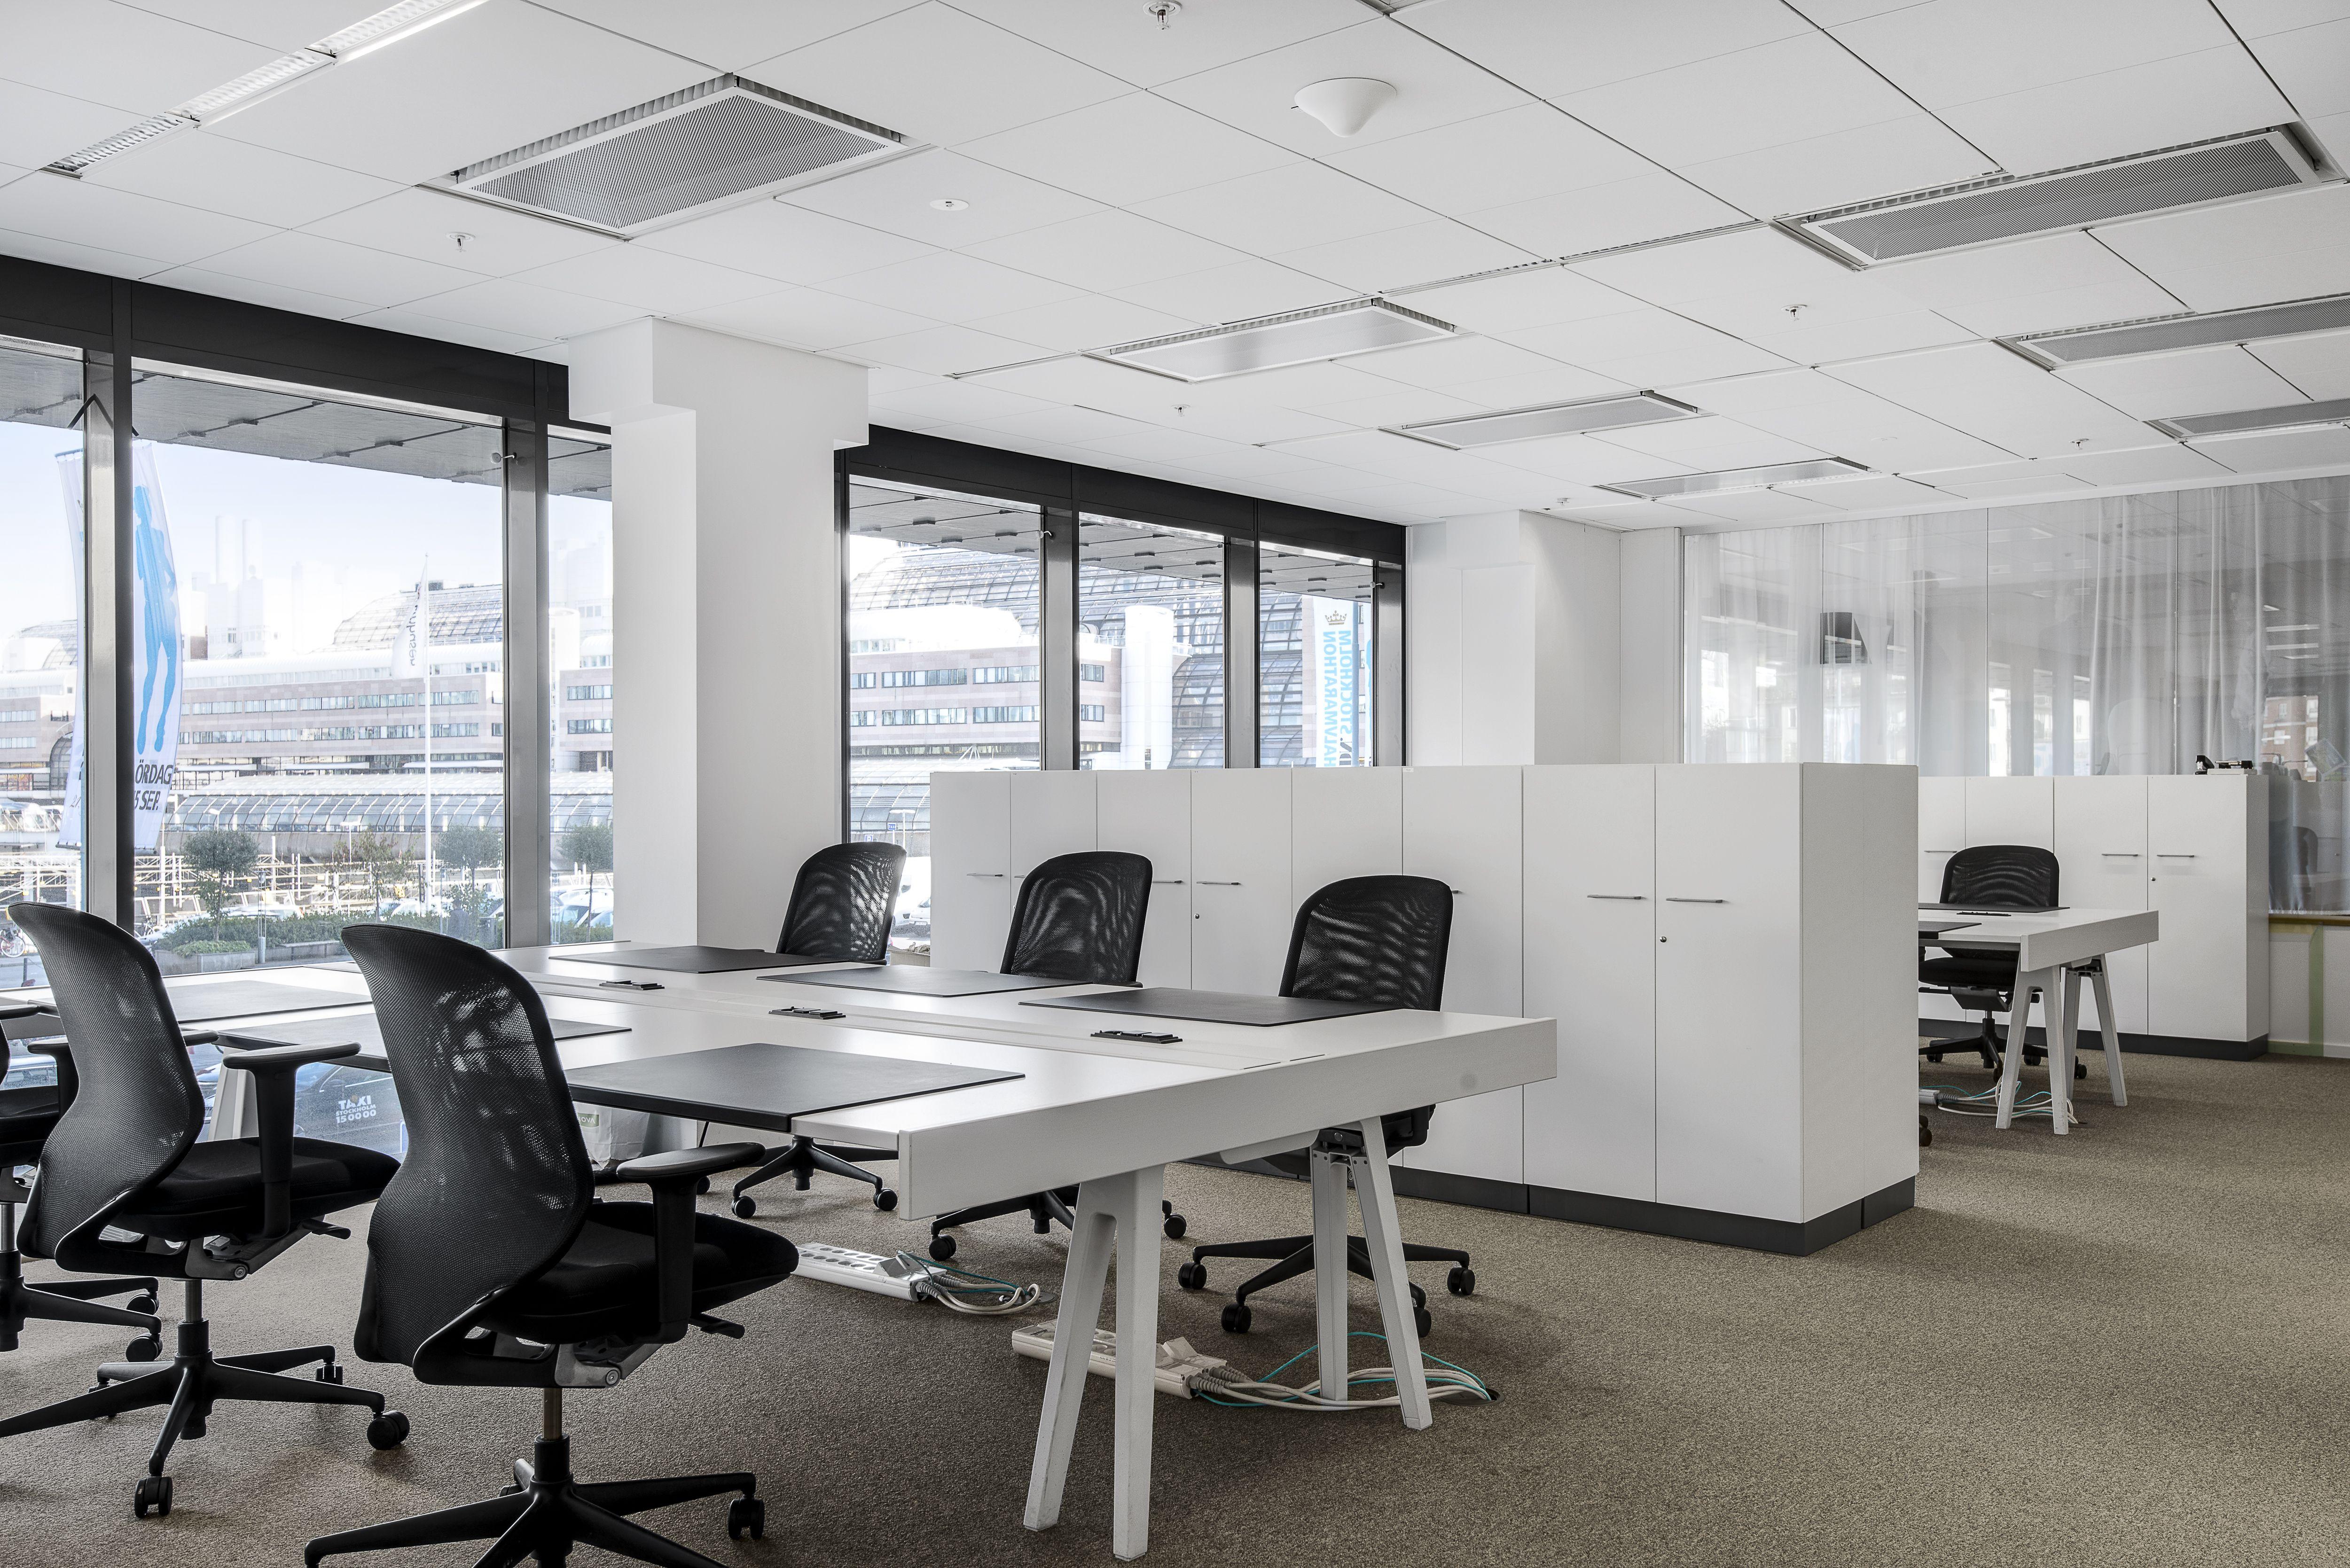 Office - Google  | Office | Pinterest | Office decor ...